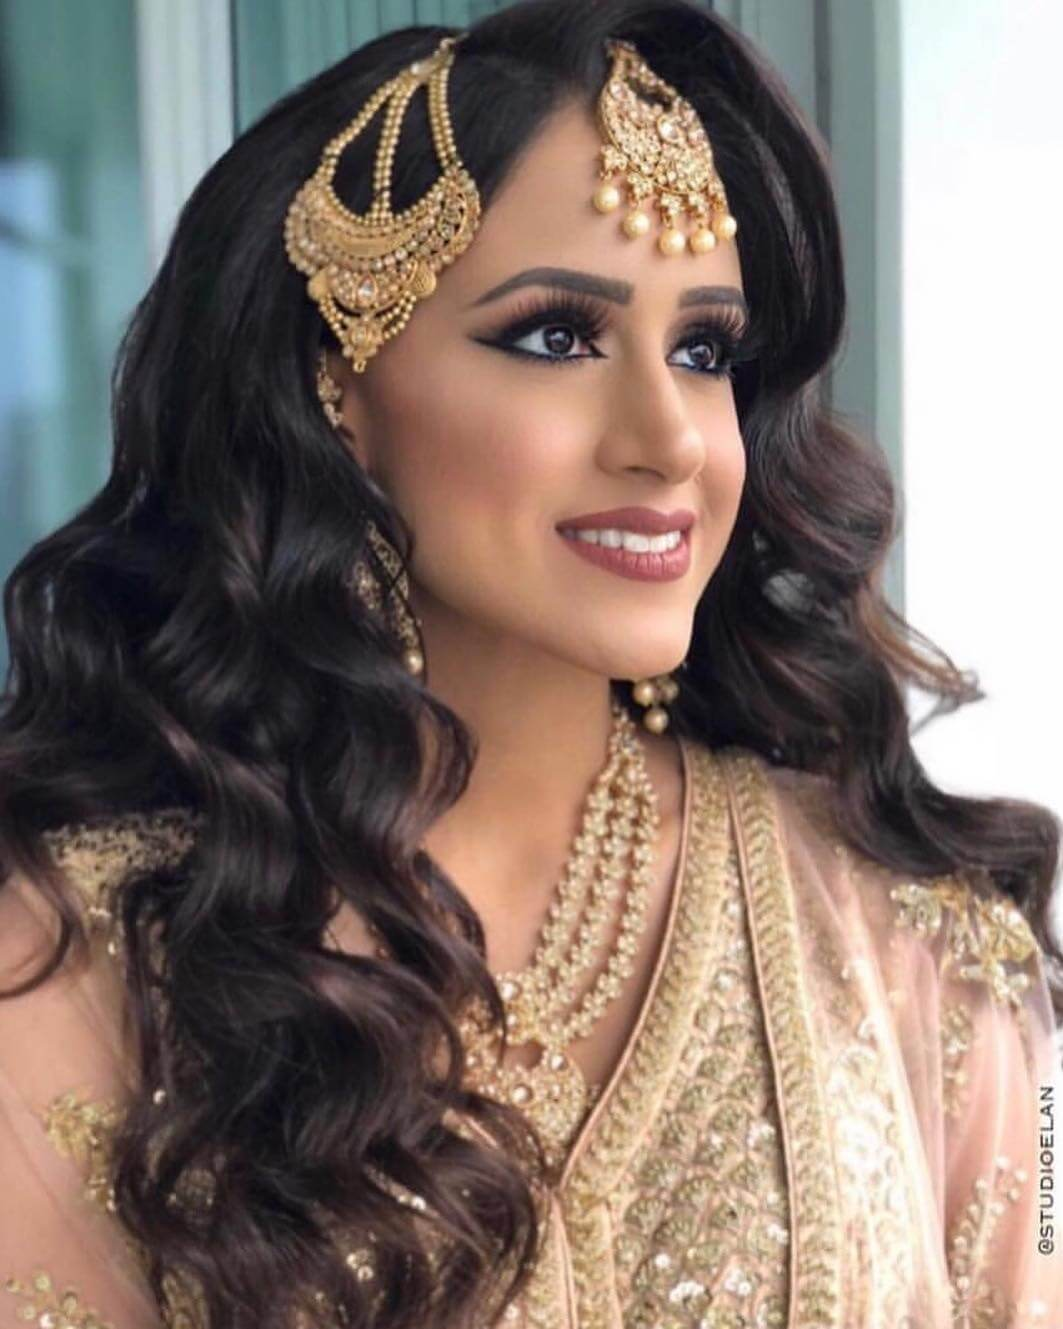 Antique Gold Passa/Jhoomar Designs For Muslim Bride